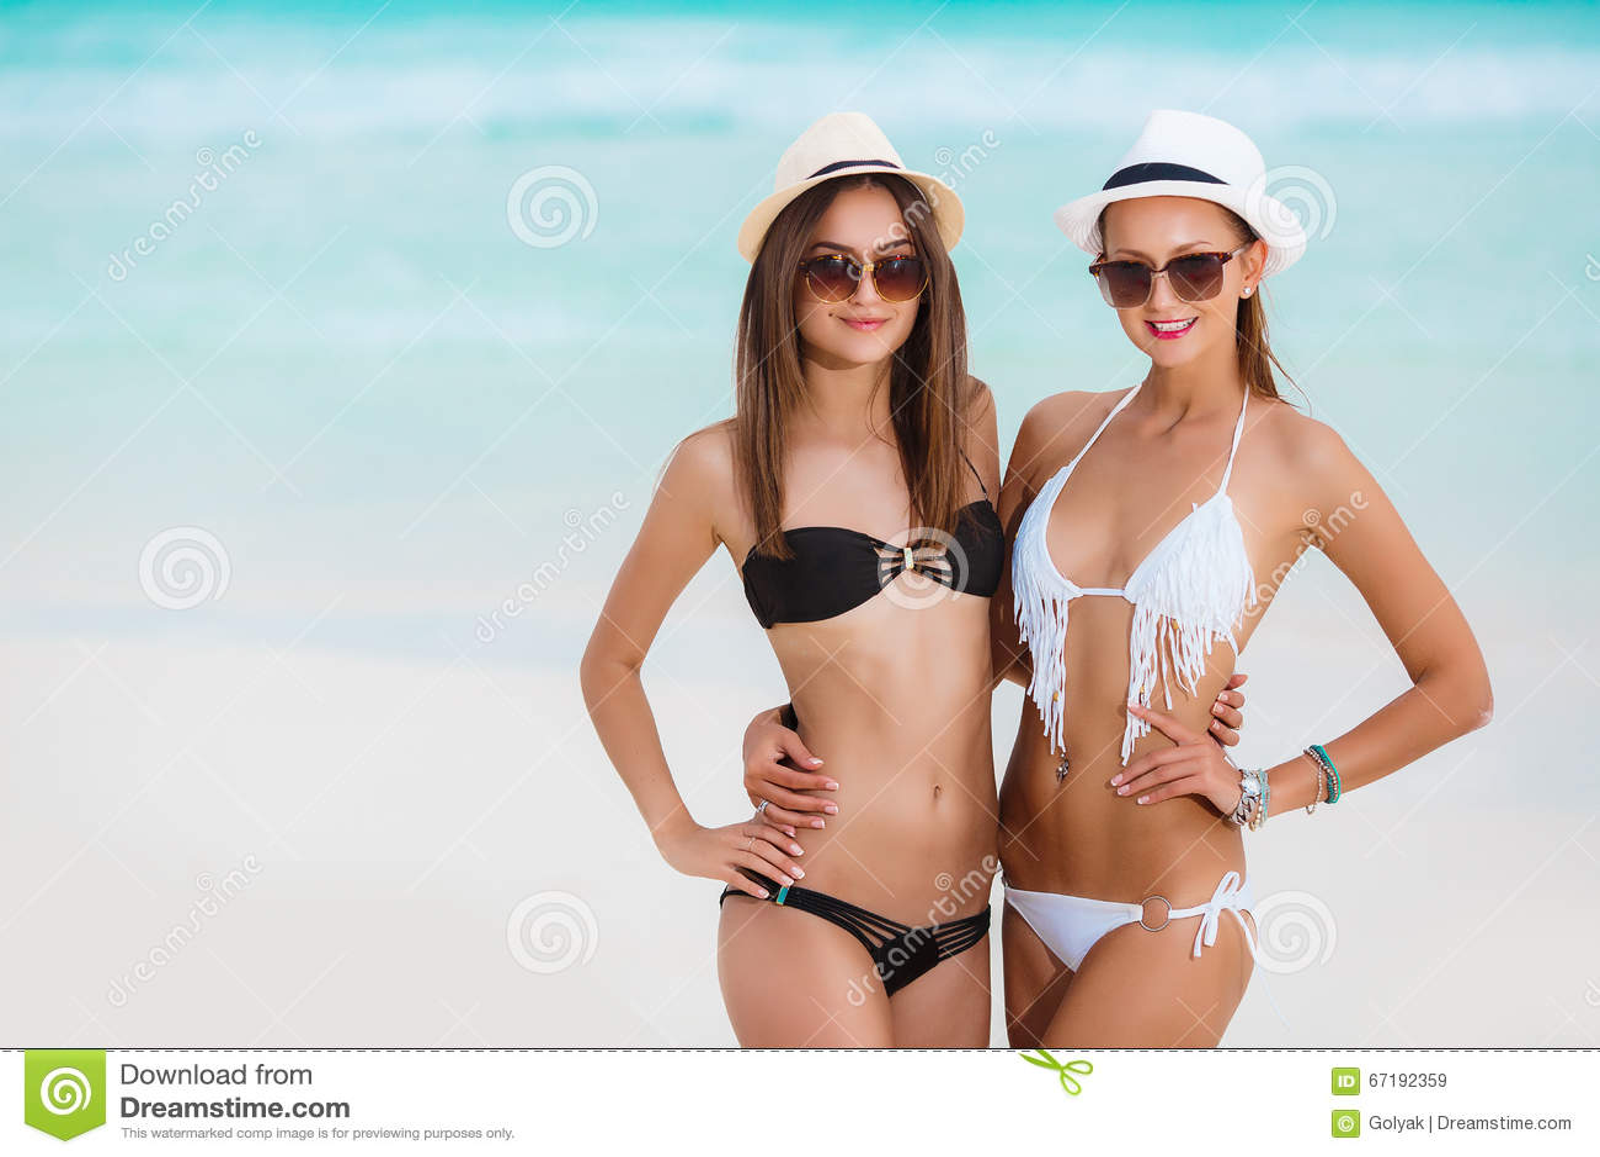 Fashionable glasses for women